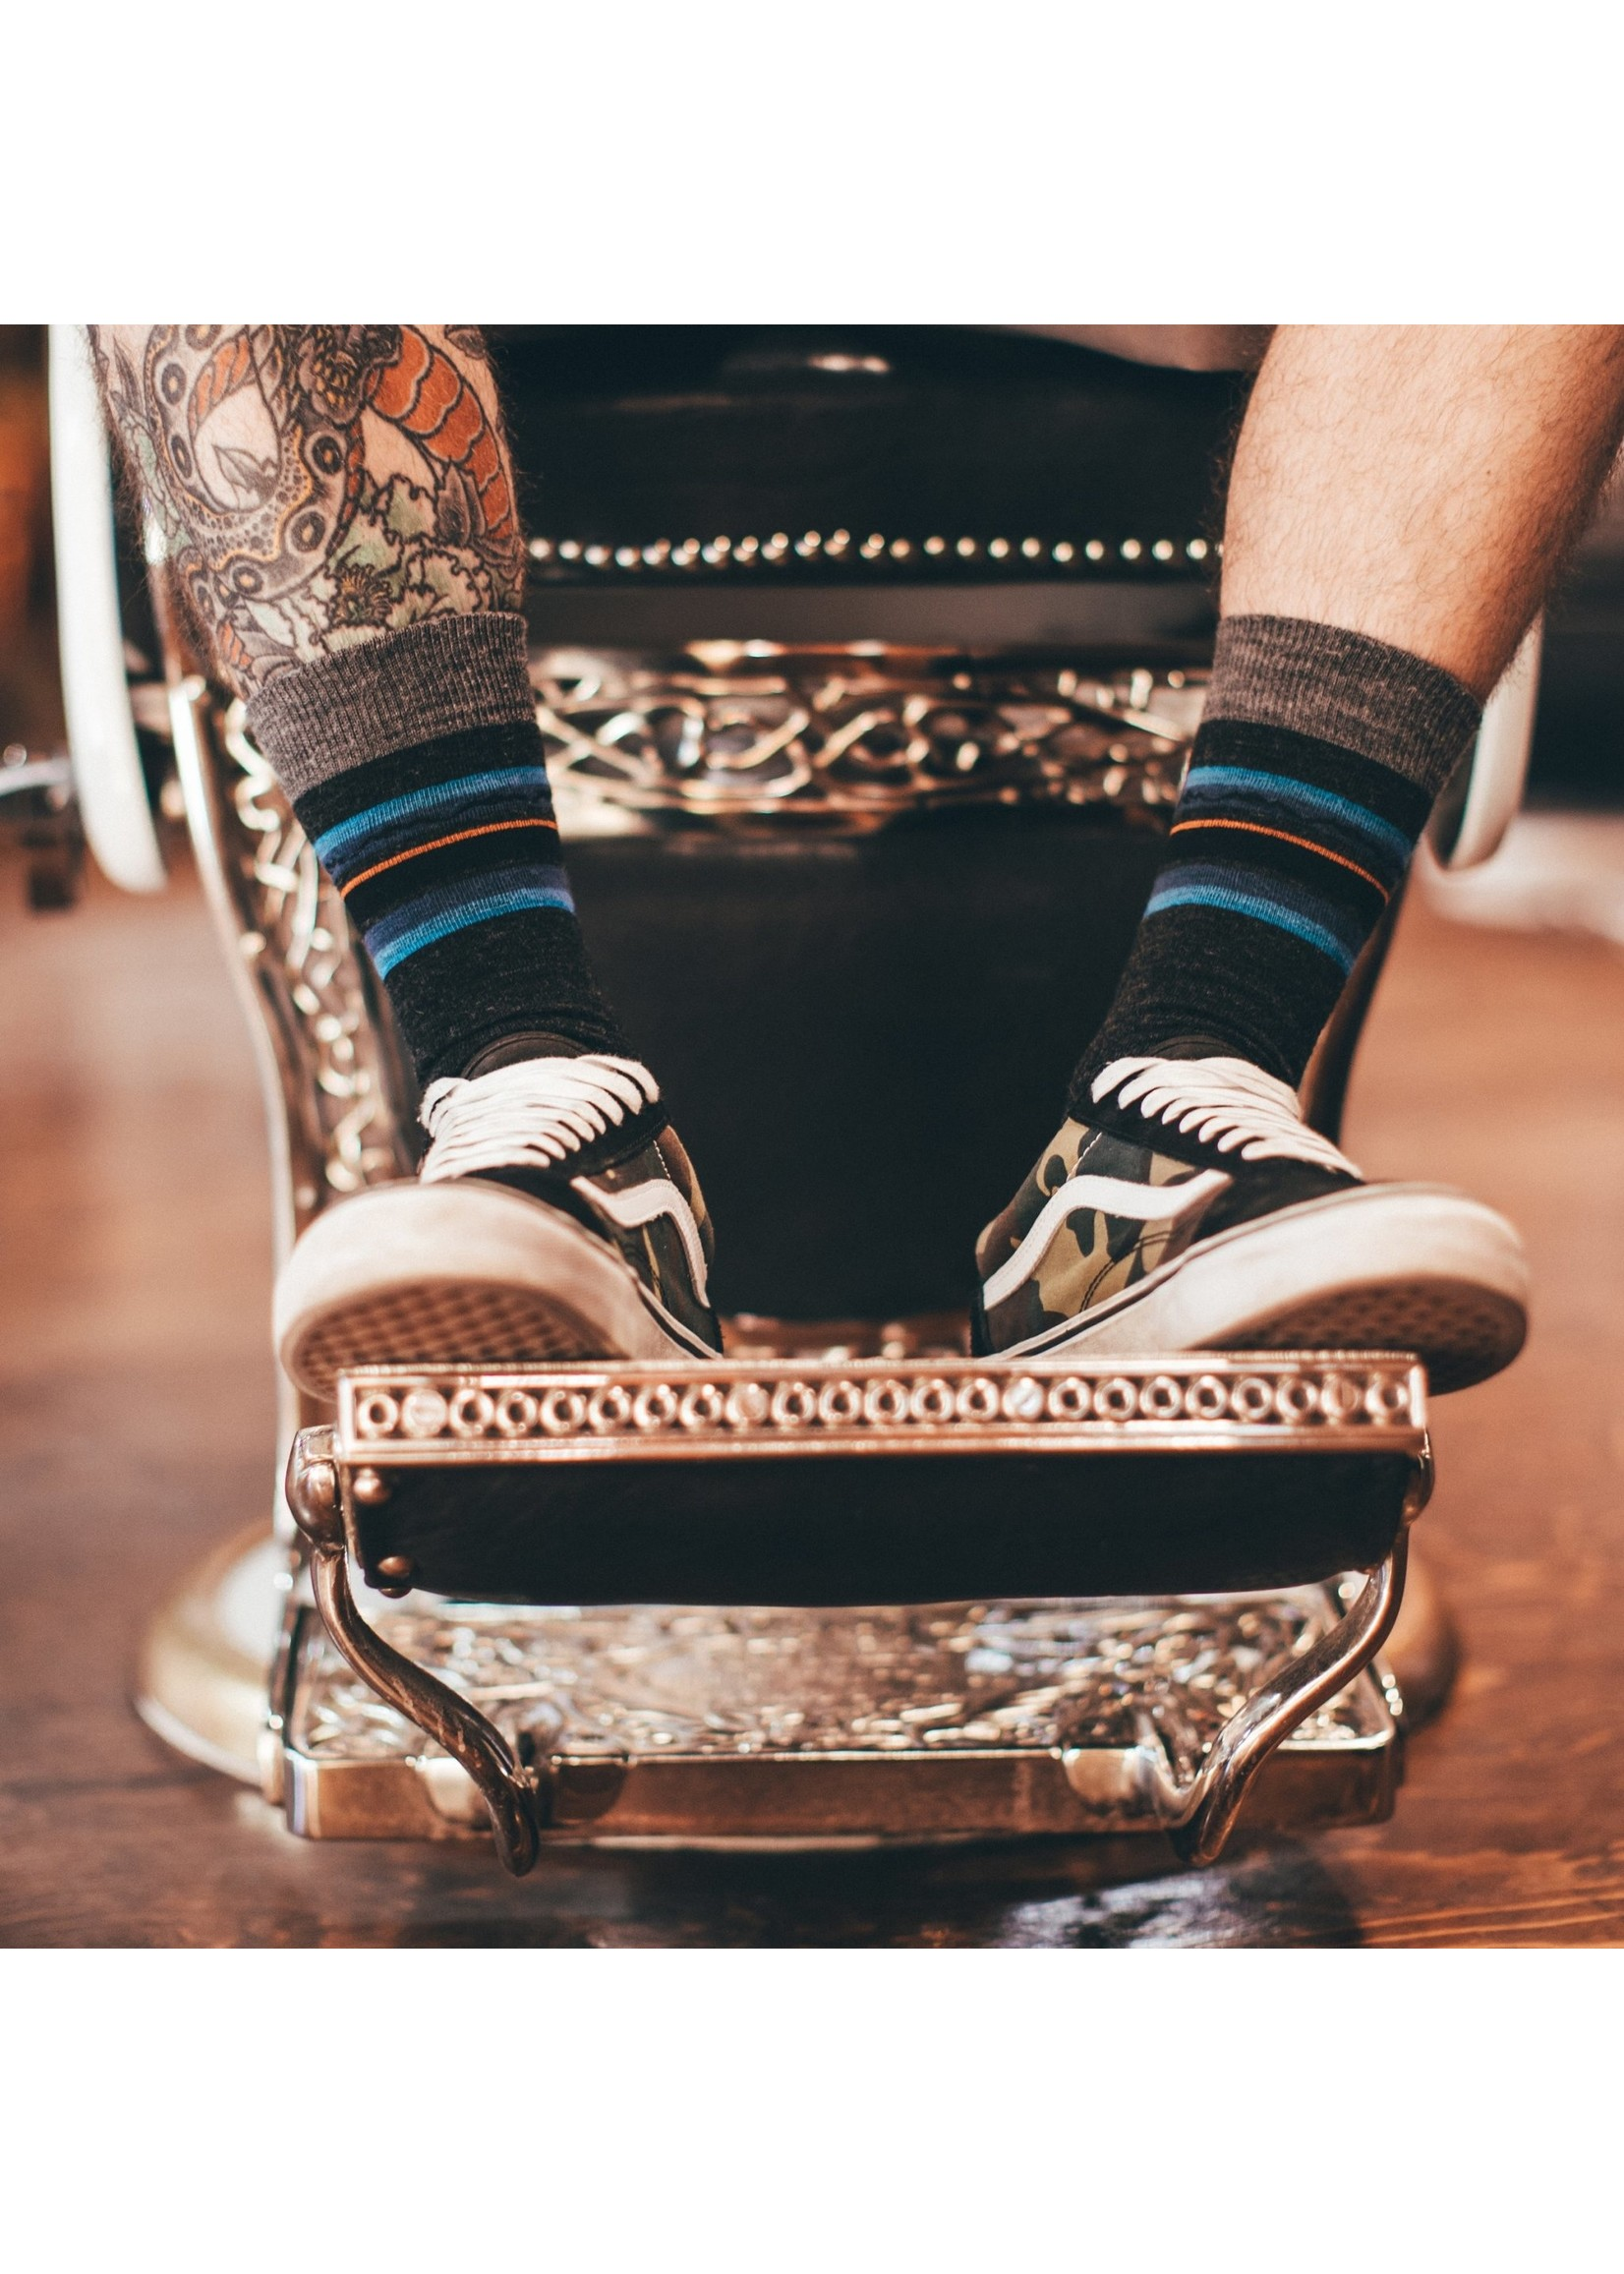 Darn Tough Men's Whetstone Crew Lightweight Lifestyle Socks